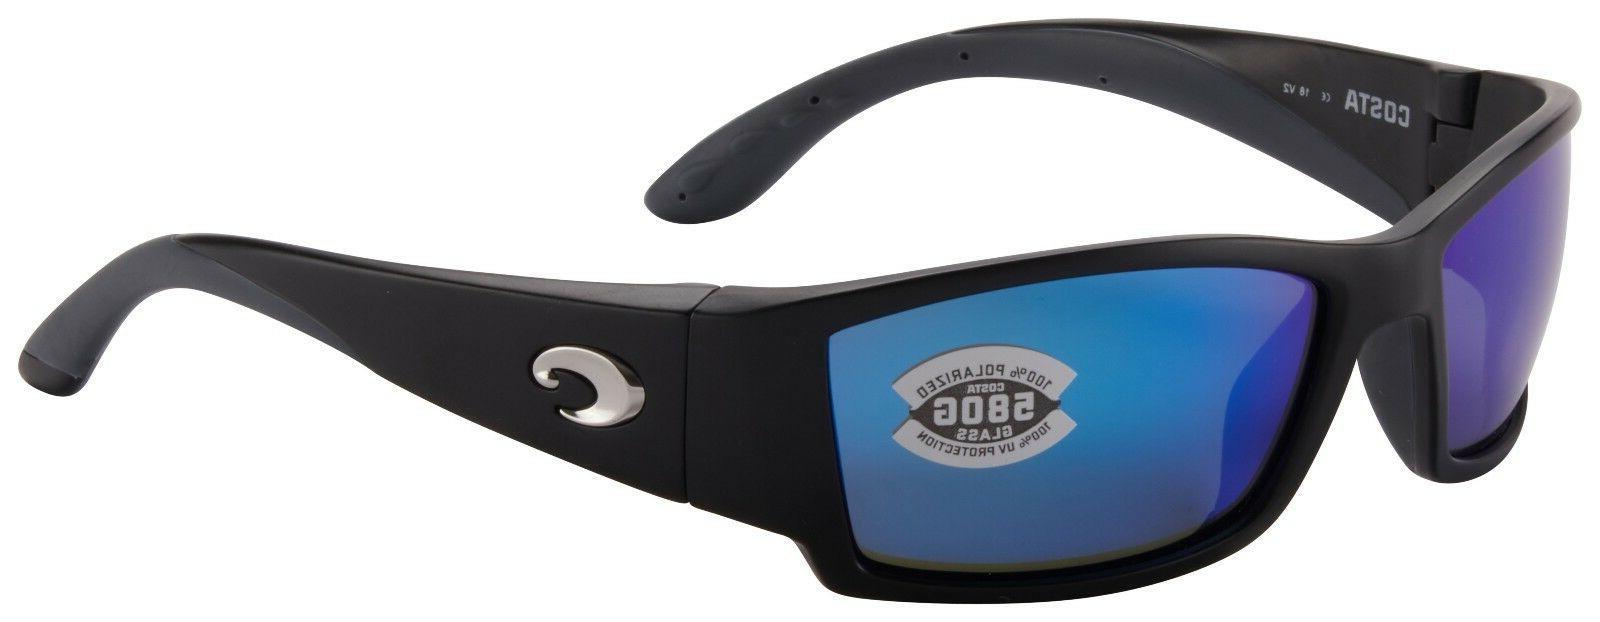 corbina polarized sunglasses